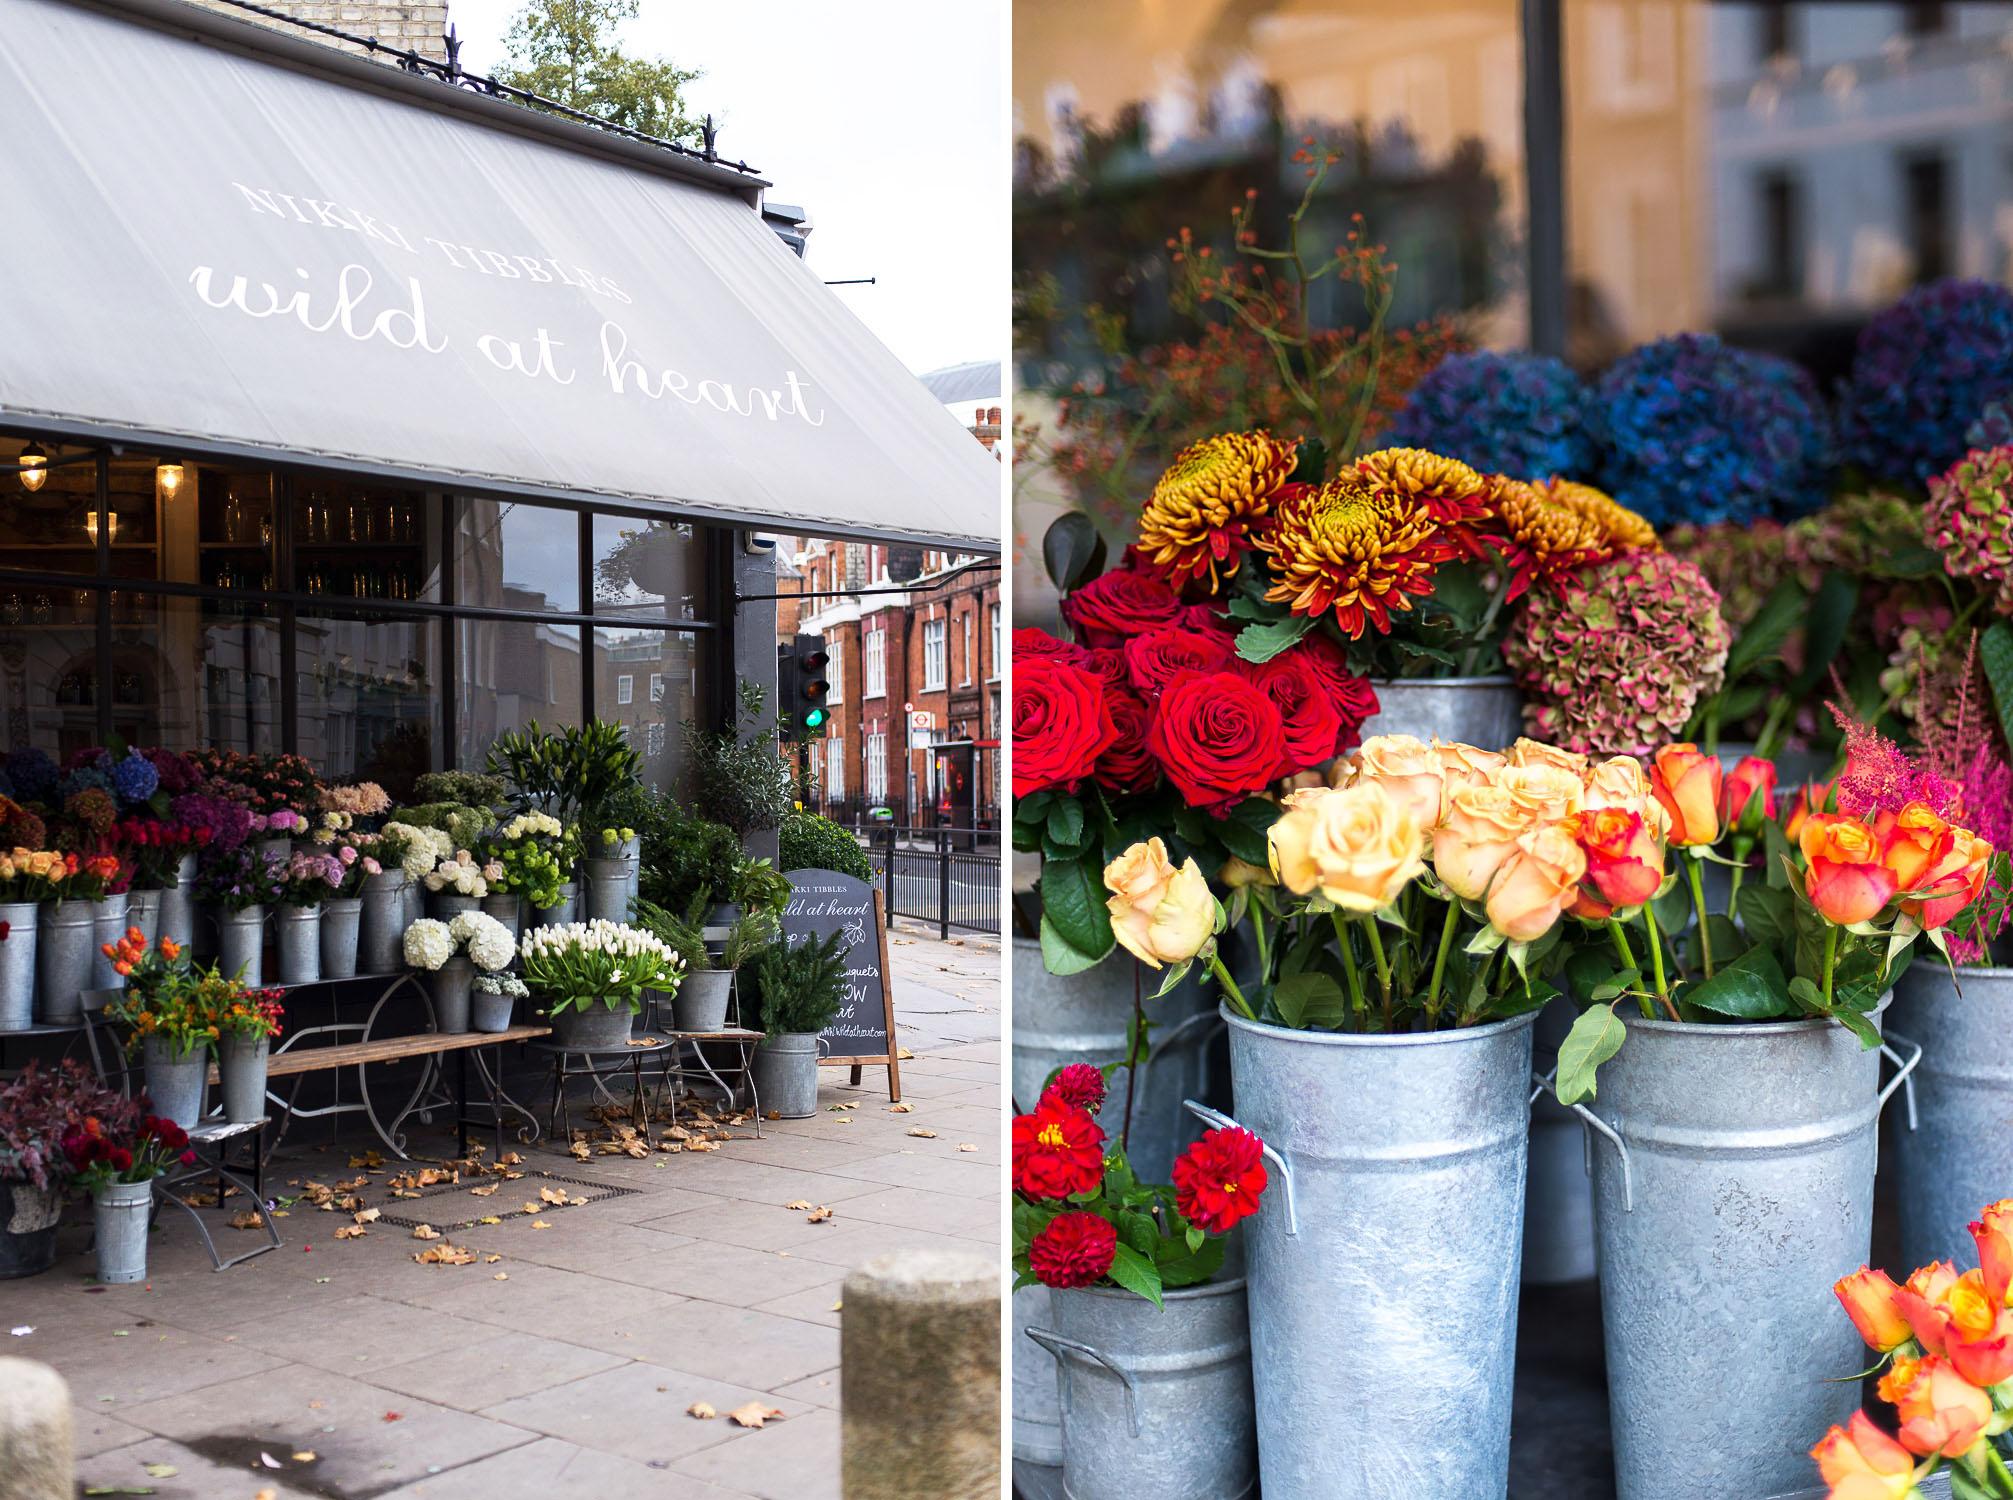 Wild at Heart florist, Pimlico